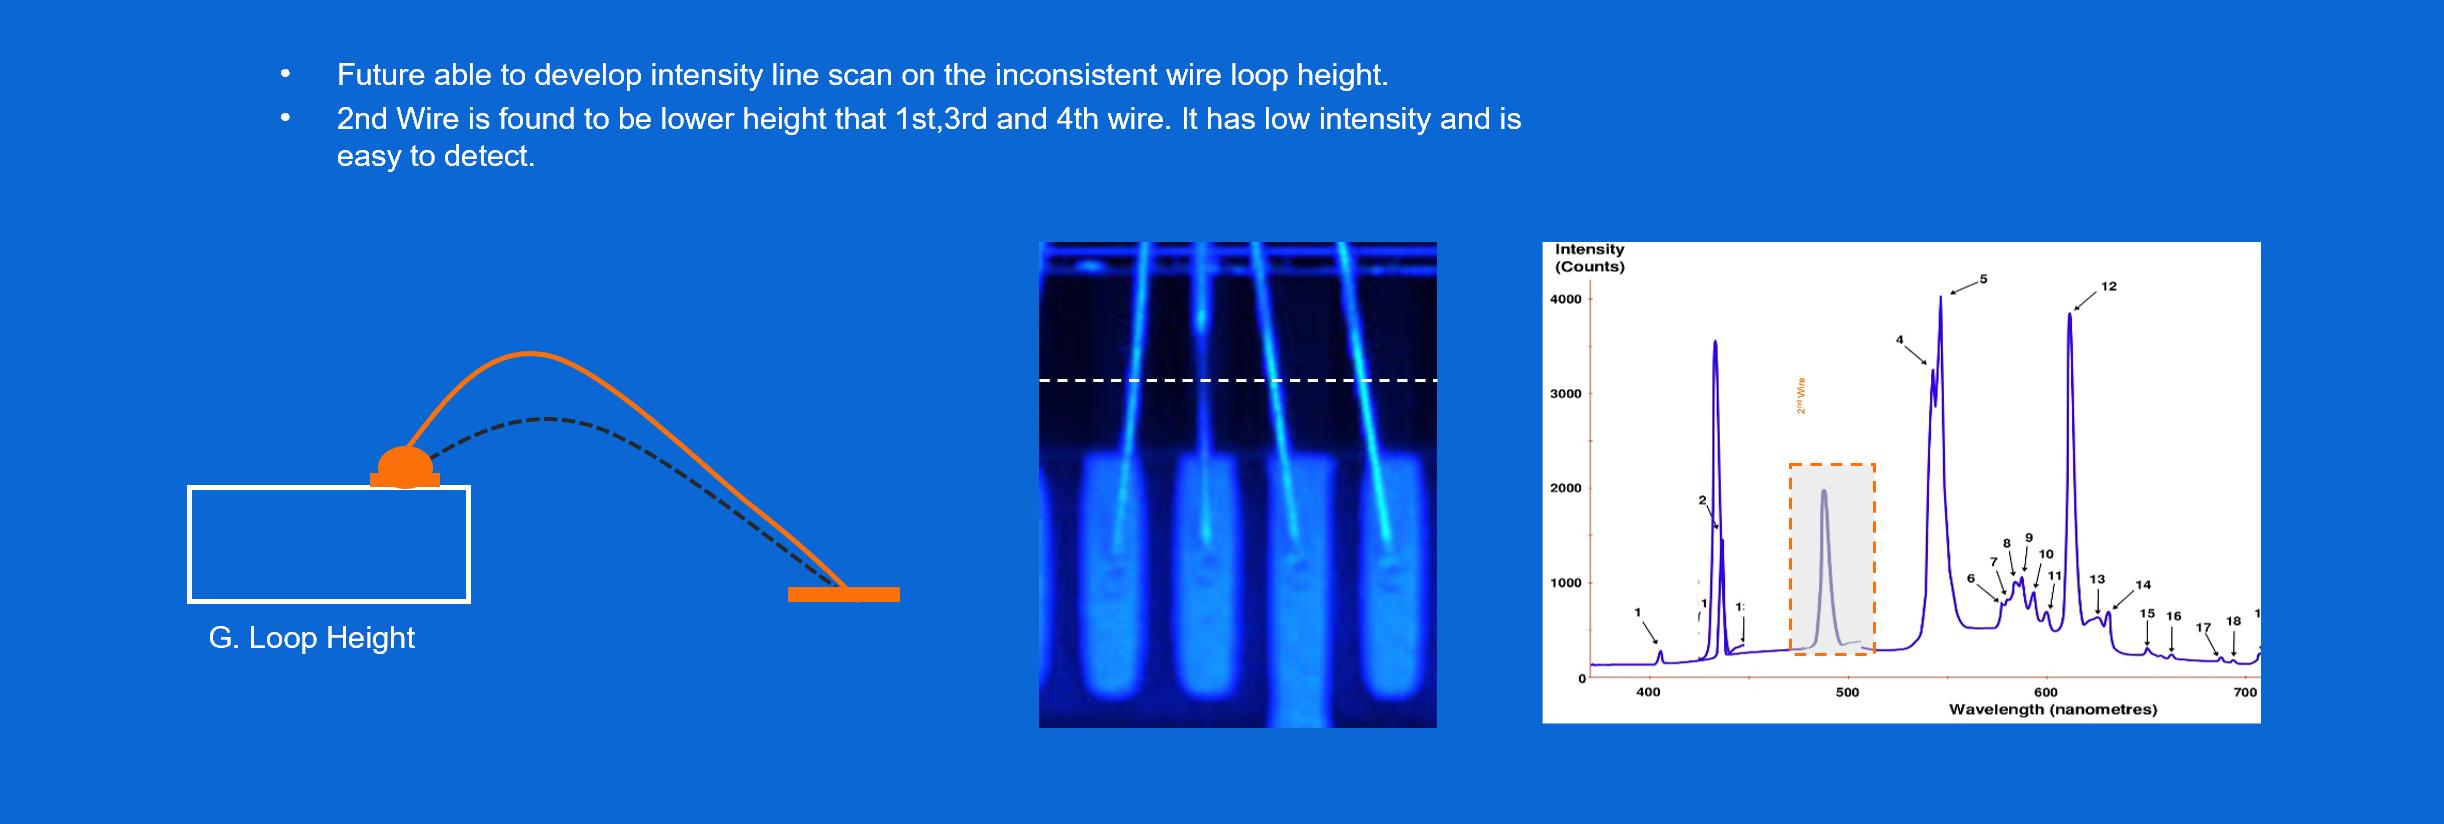 Axmatic_wire_bond_Inspection_b1